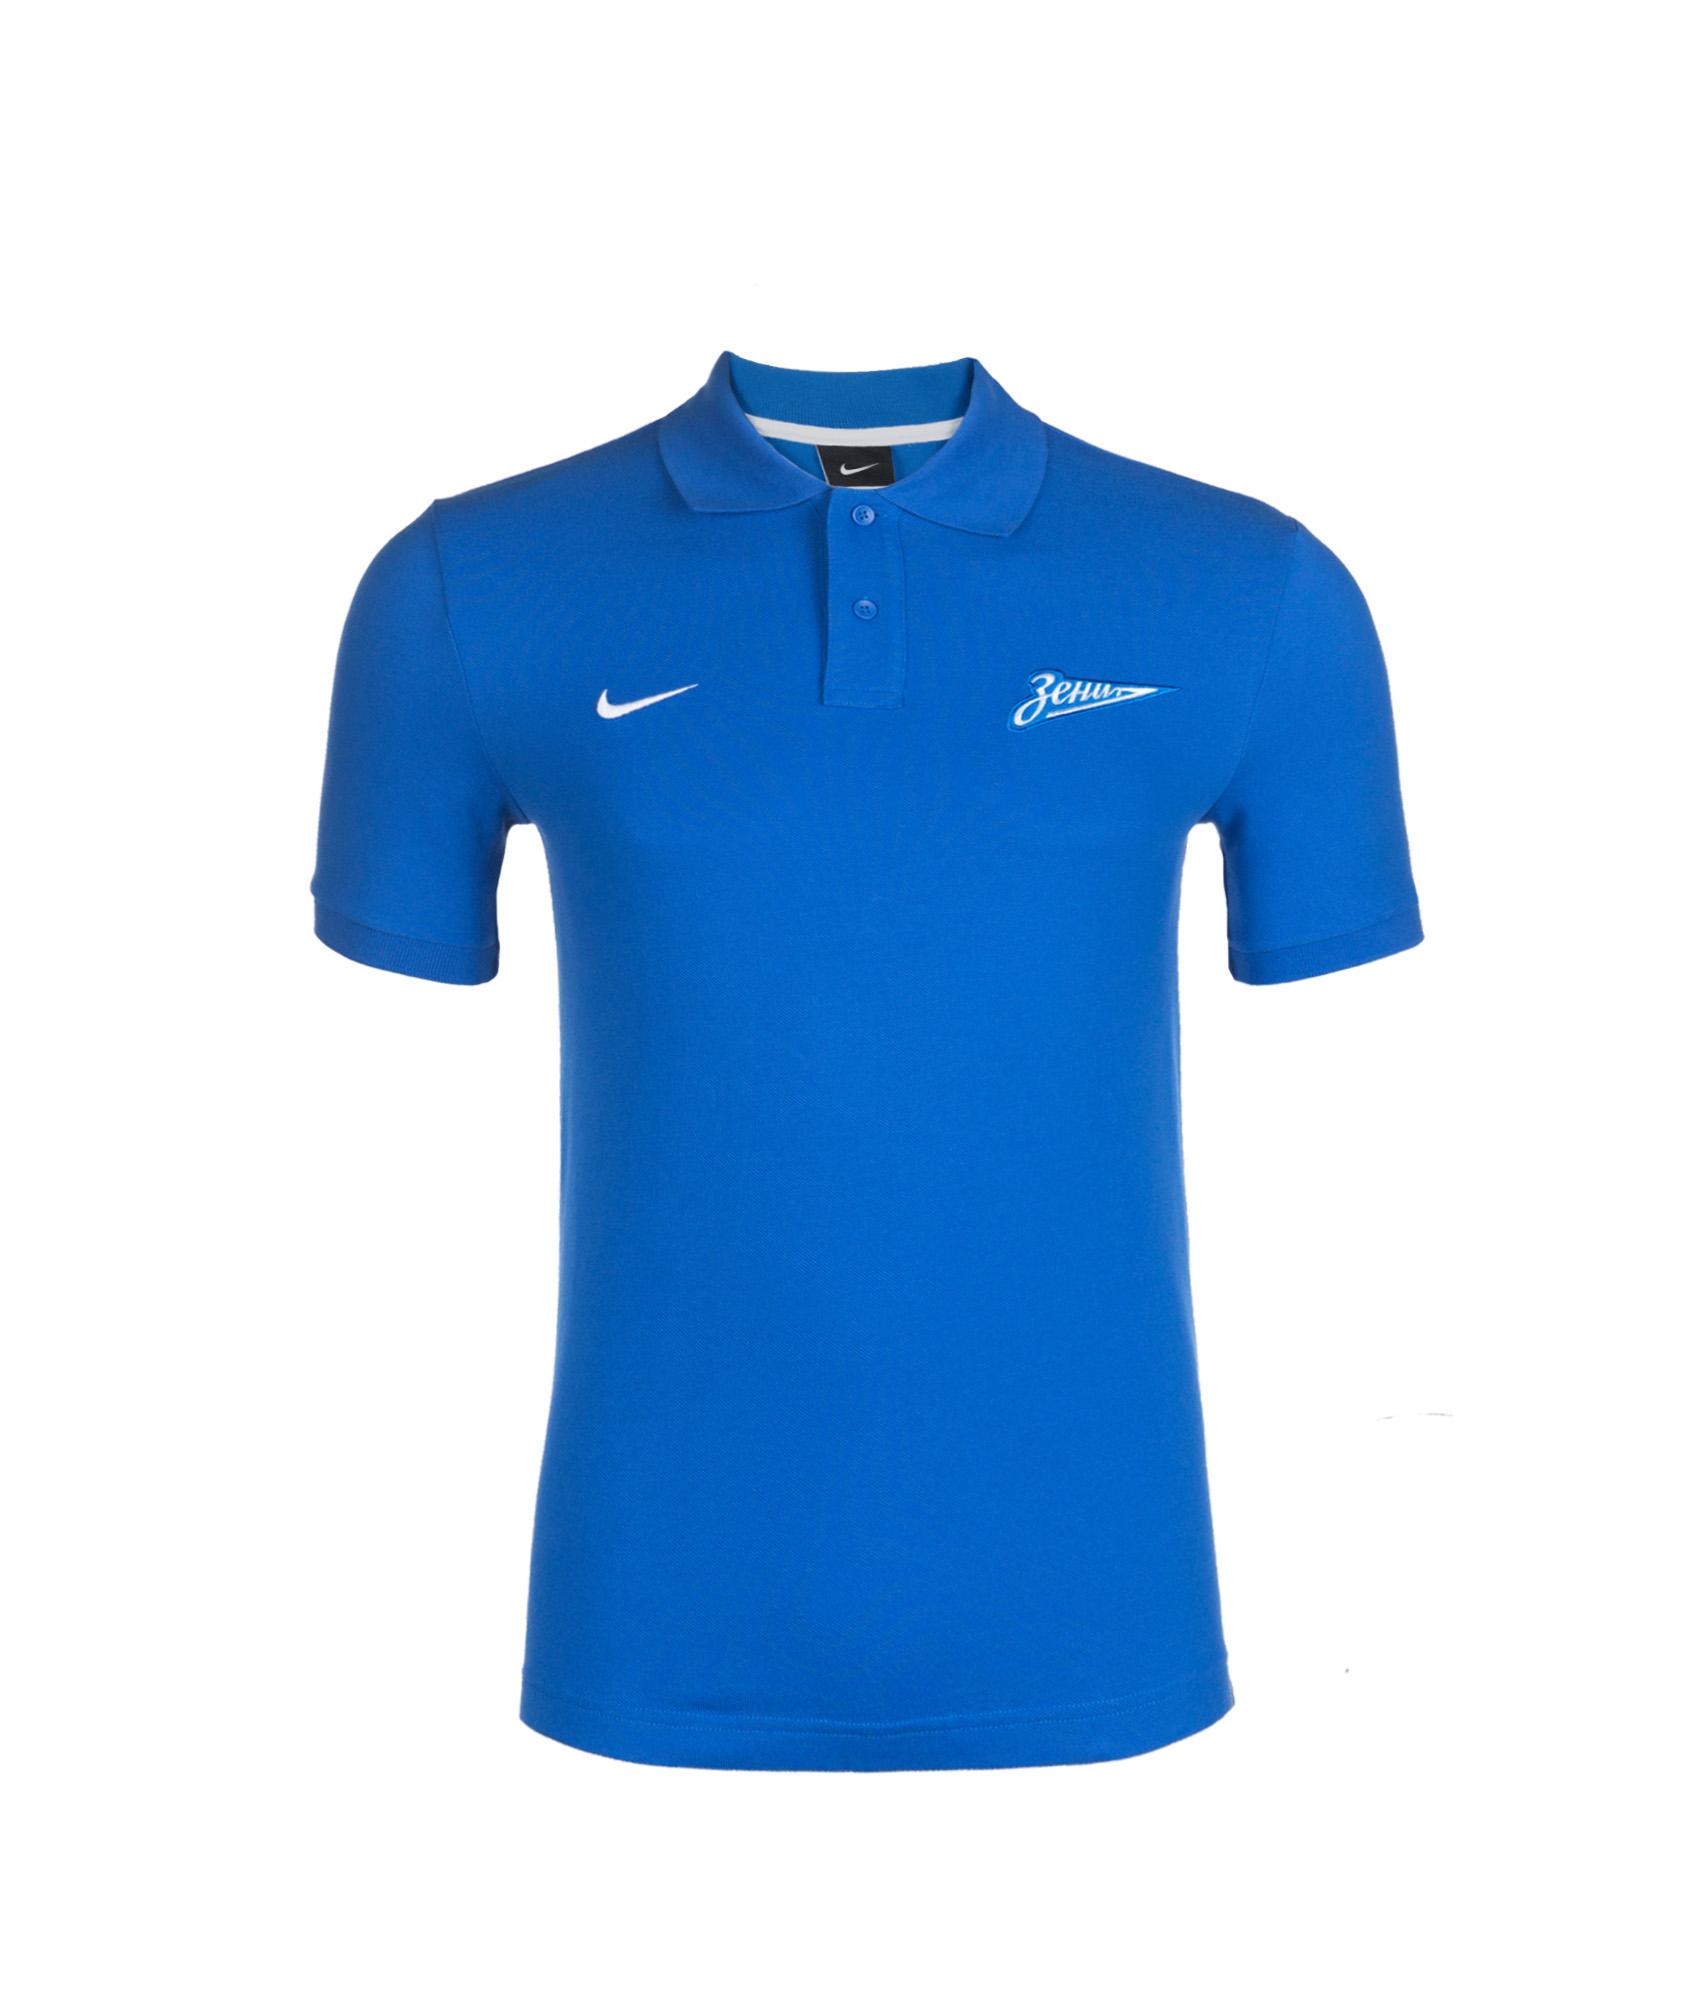 Поло Nike GS Generic Auth, Цвет-Синий, Размер-XL